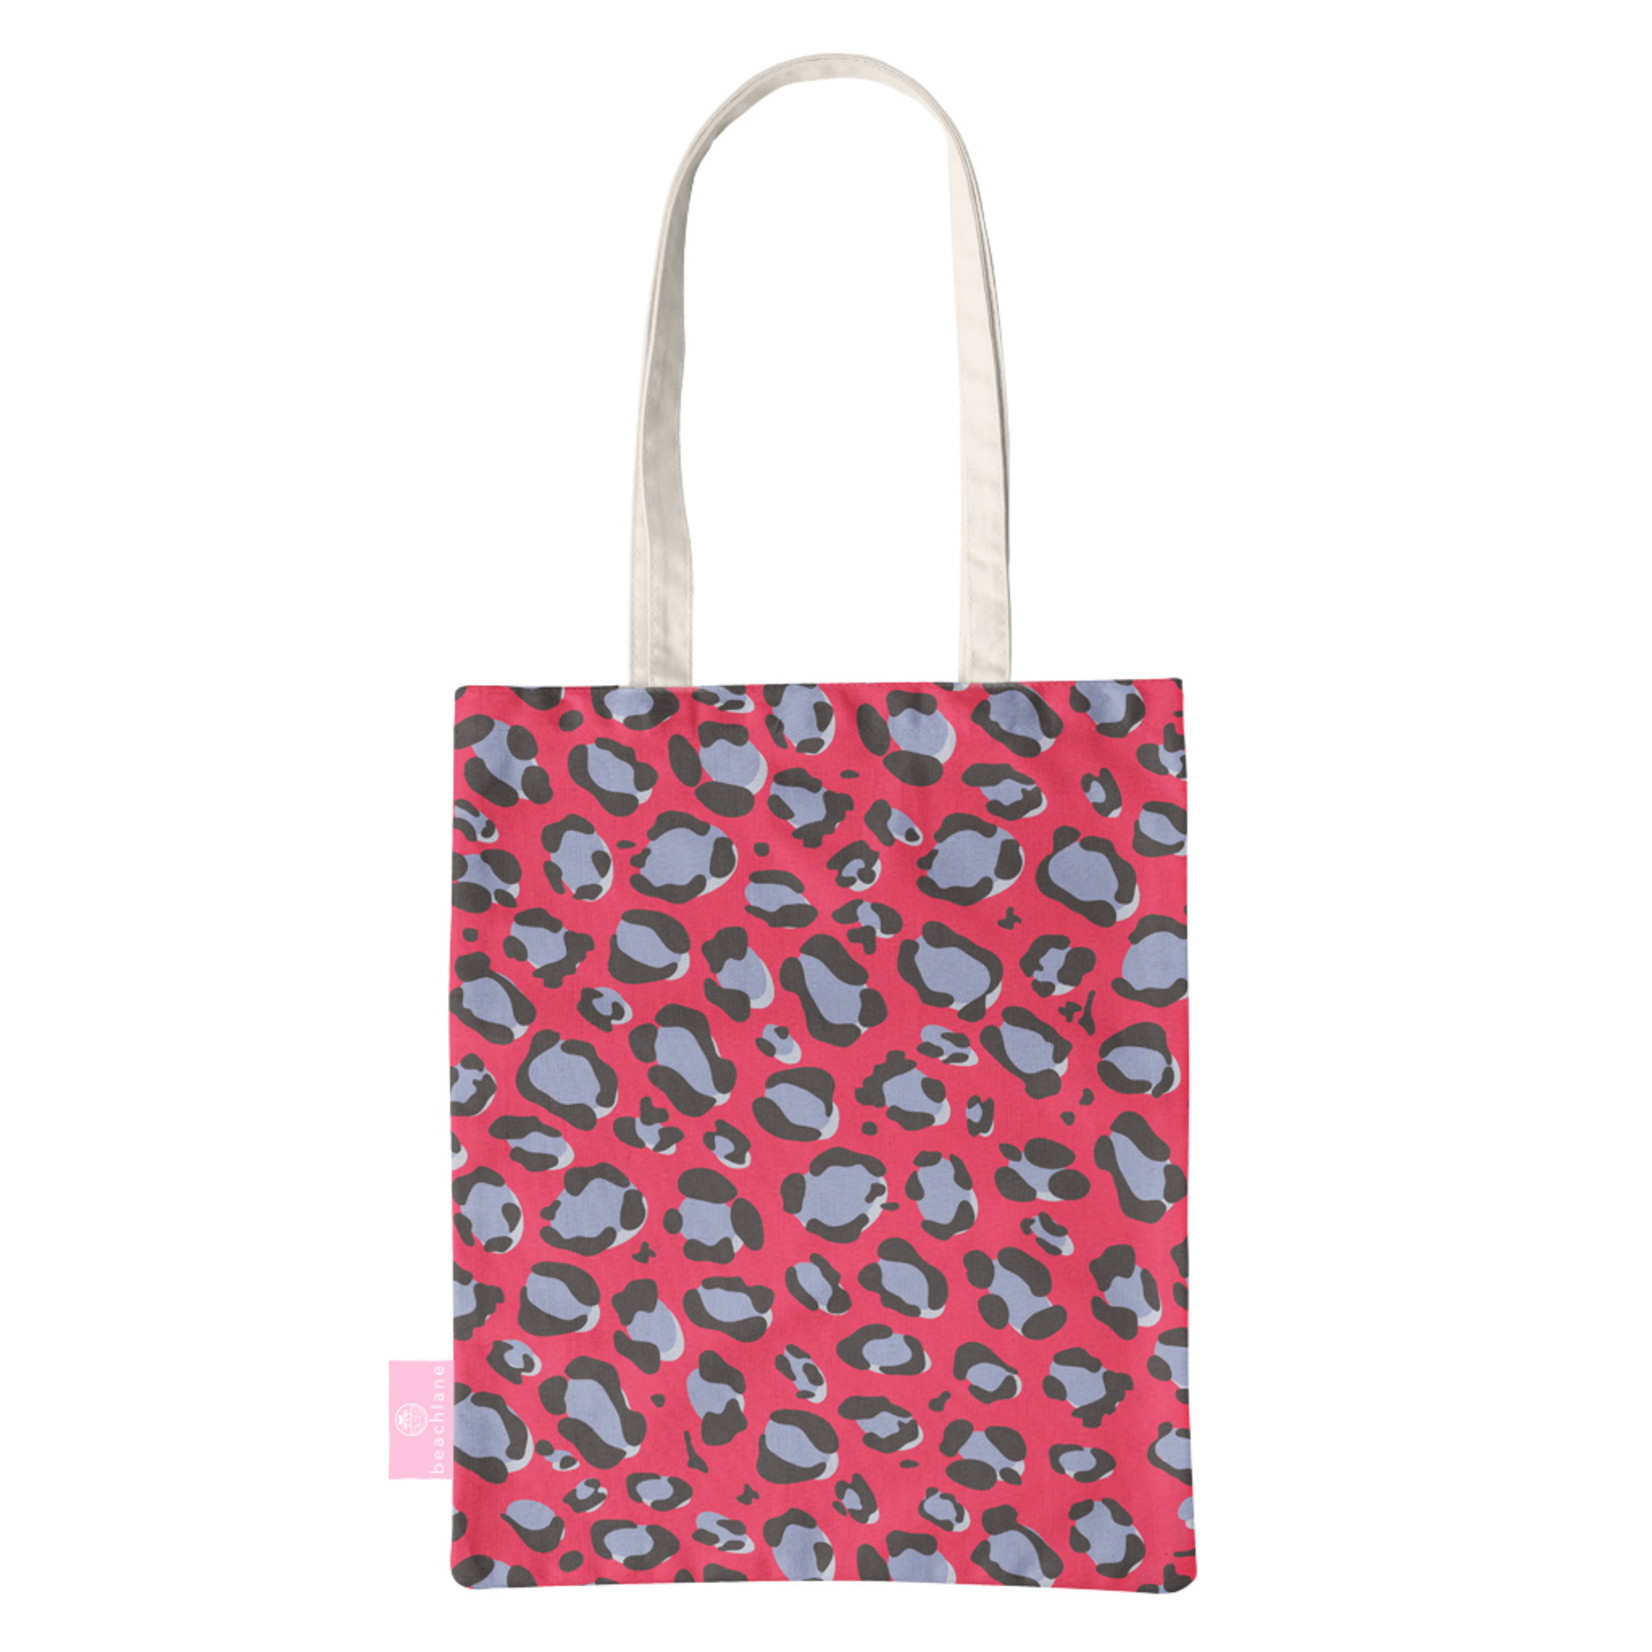 FOONCASE BEACHLANE - Katoenen tasje - Canvas Tote Bag Shopper - Luipaard / Leopard print Rood - Schoudertas / Boodschappen tas